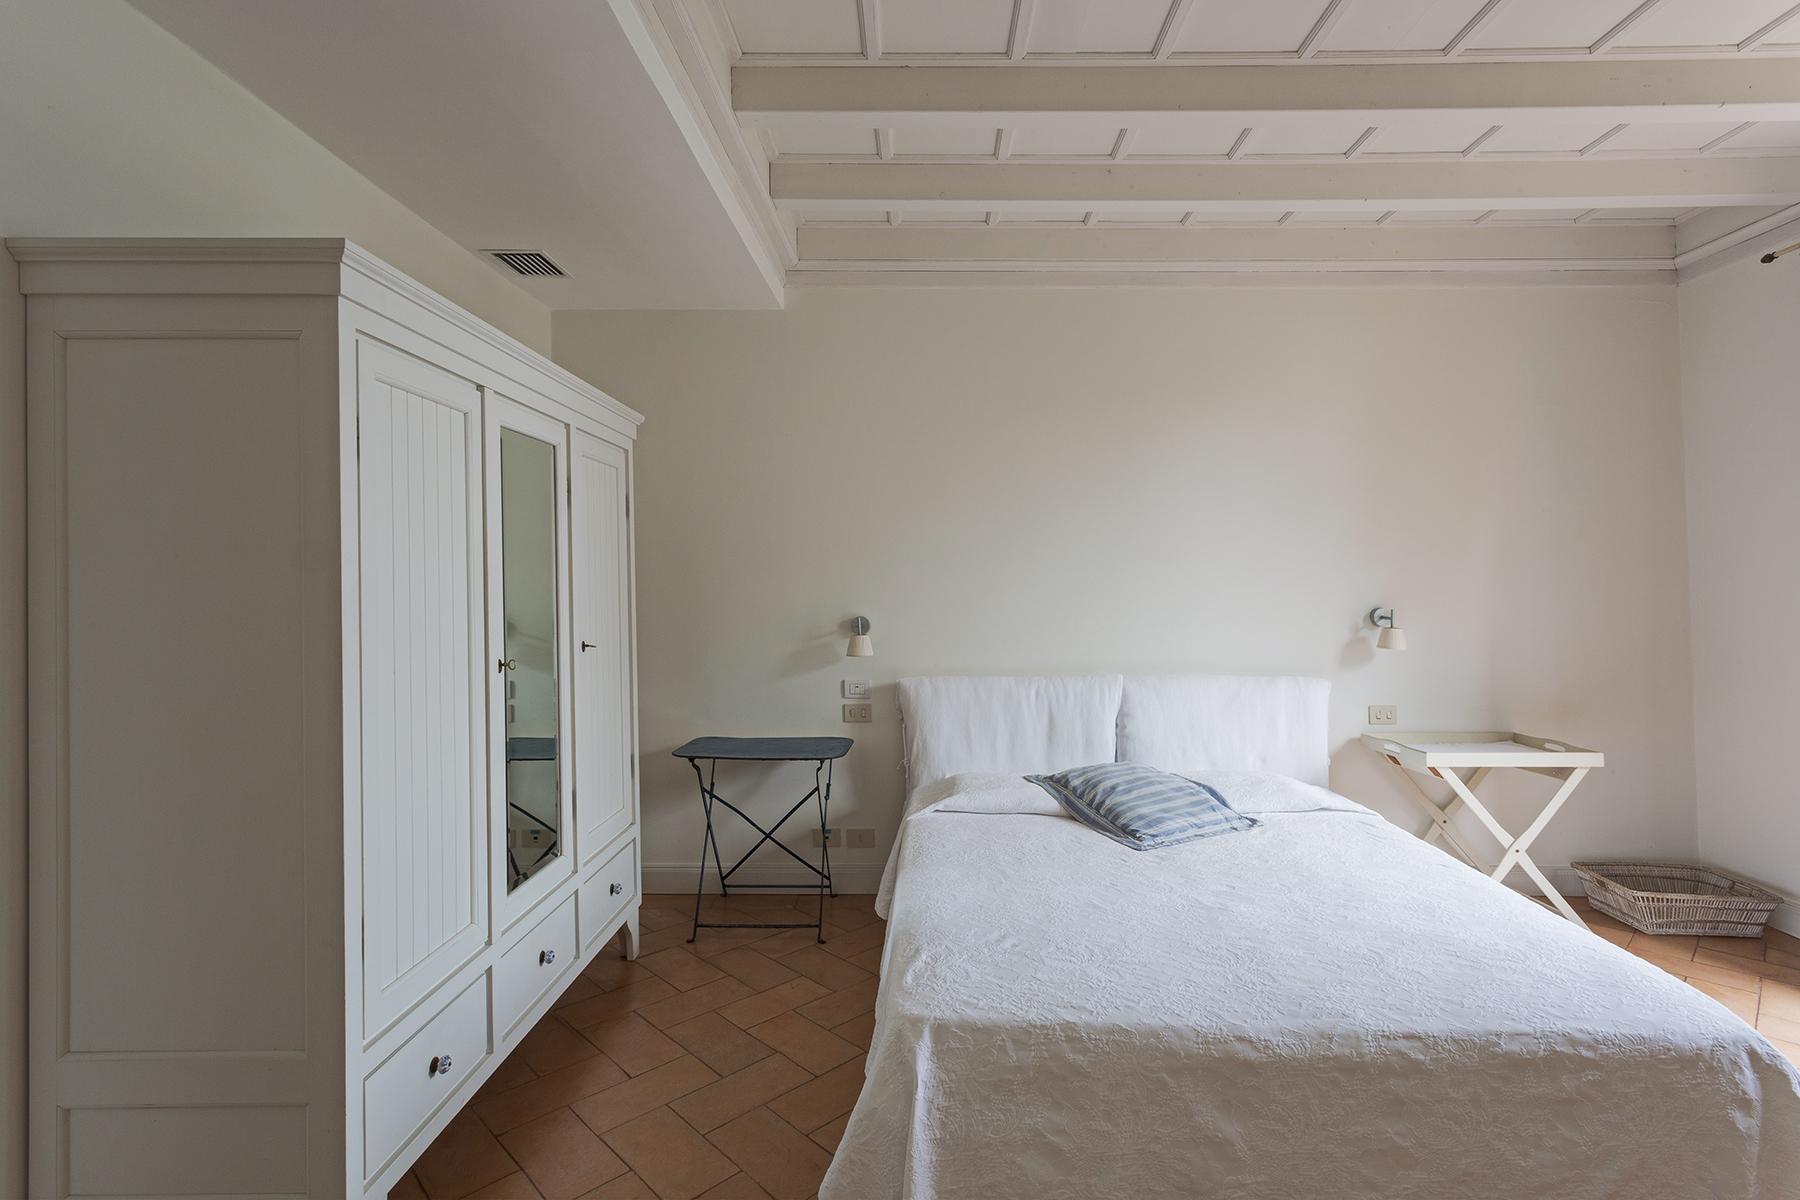 Villa in Vendita a Santa Margherita Ligure: 5 locali, 580 mq - Foto 20